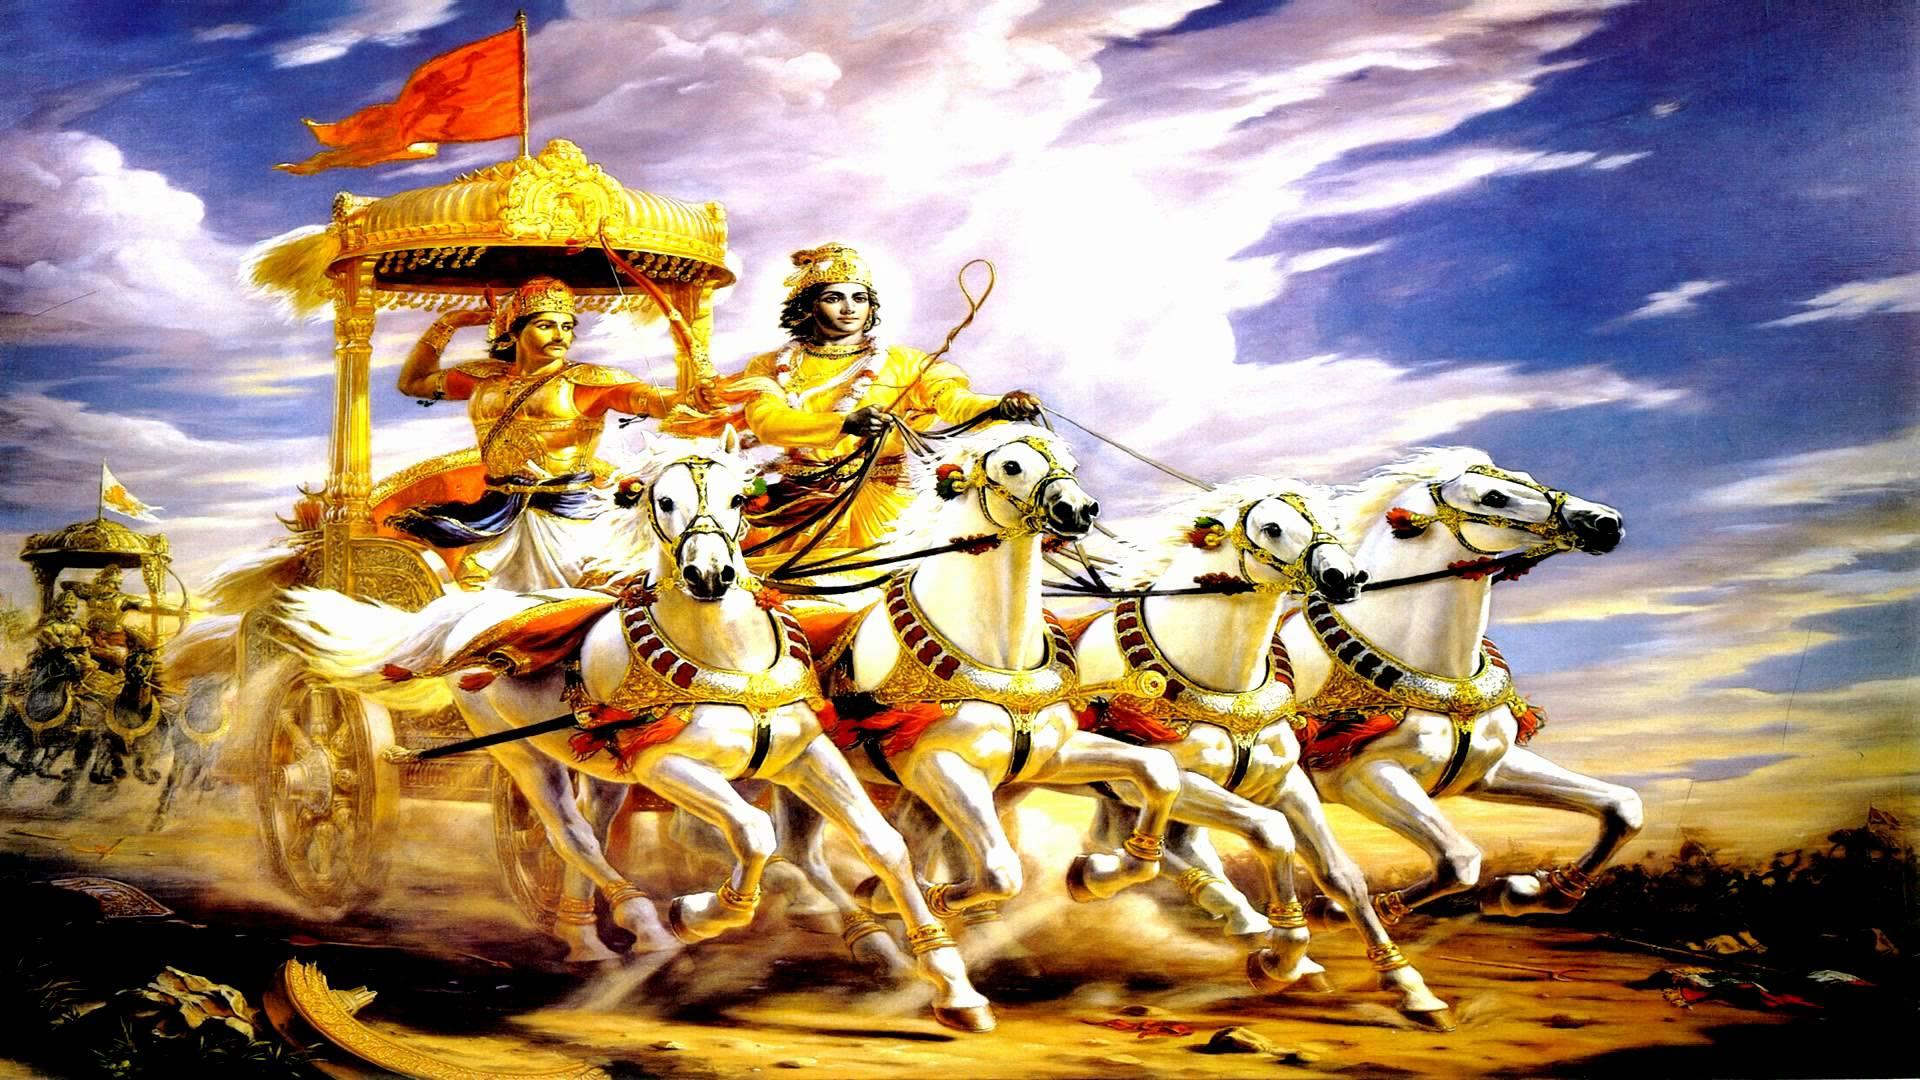 Summary of Bhagavad Gita — 700 verse scripture of Hindu Epic ...